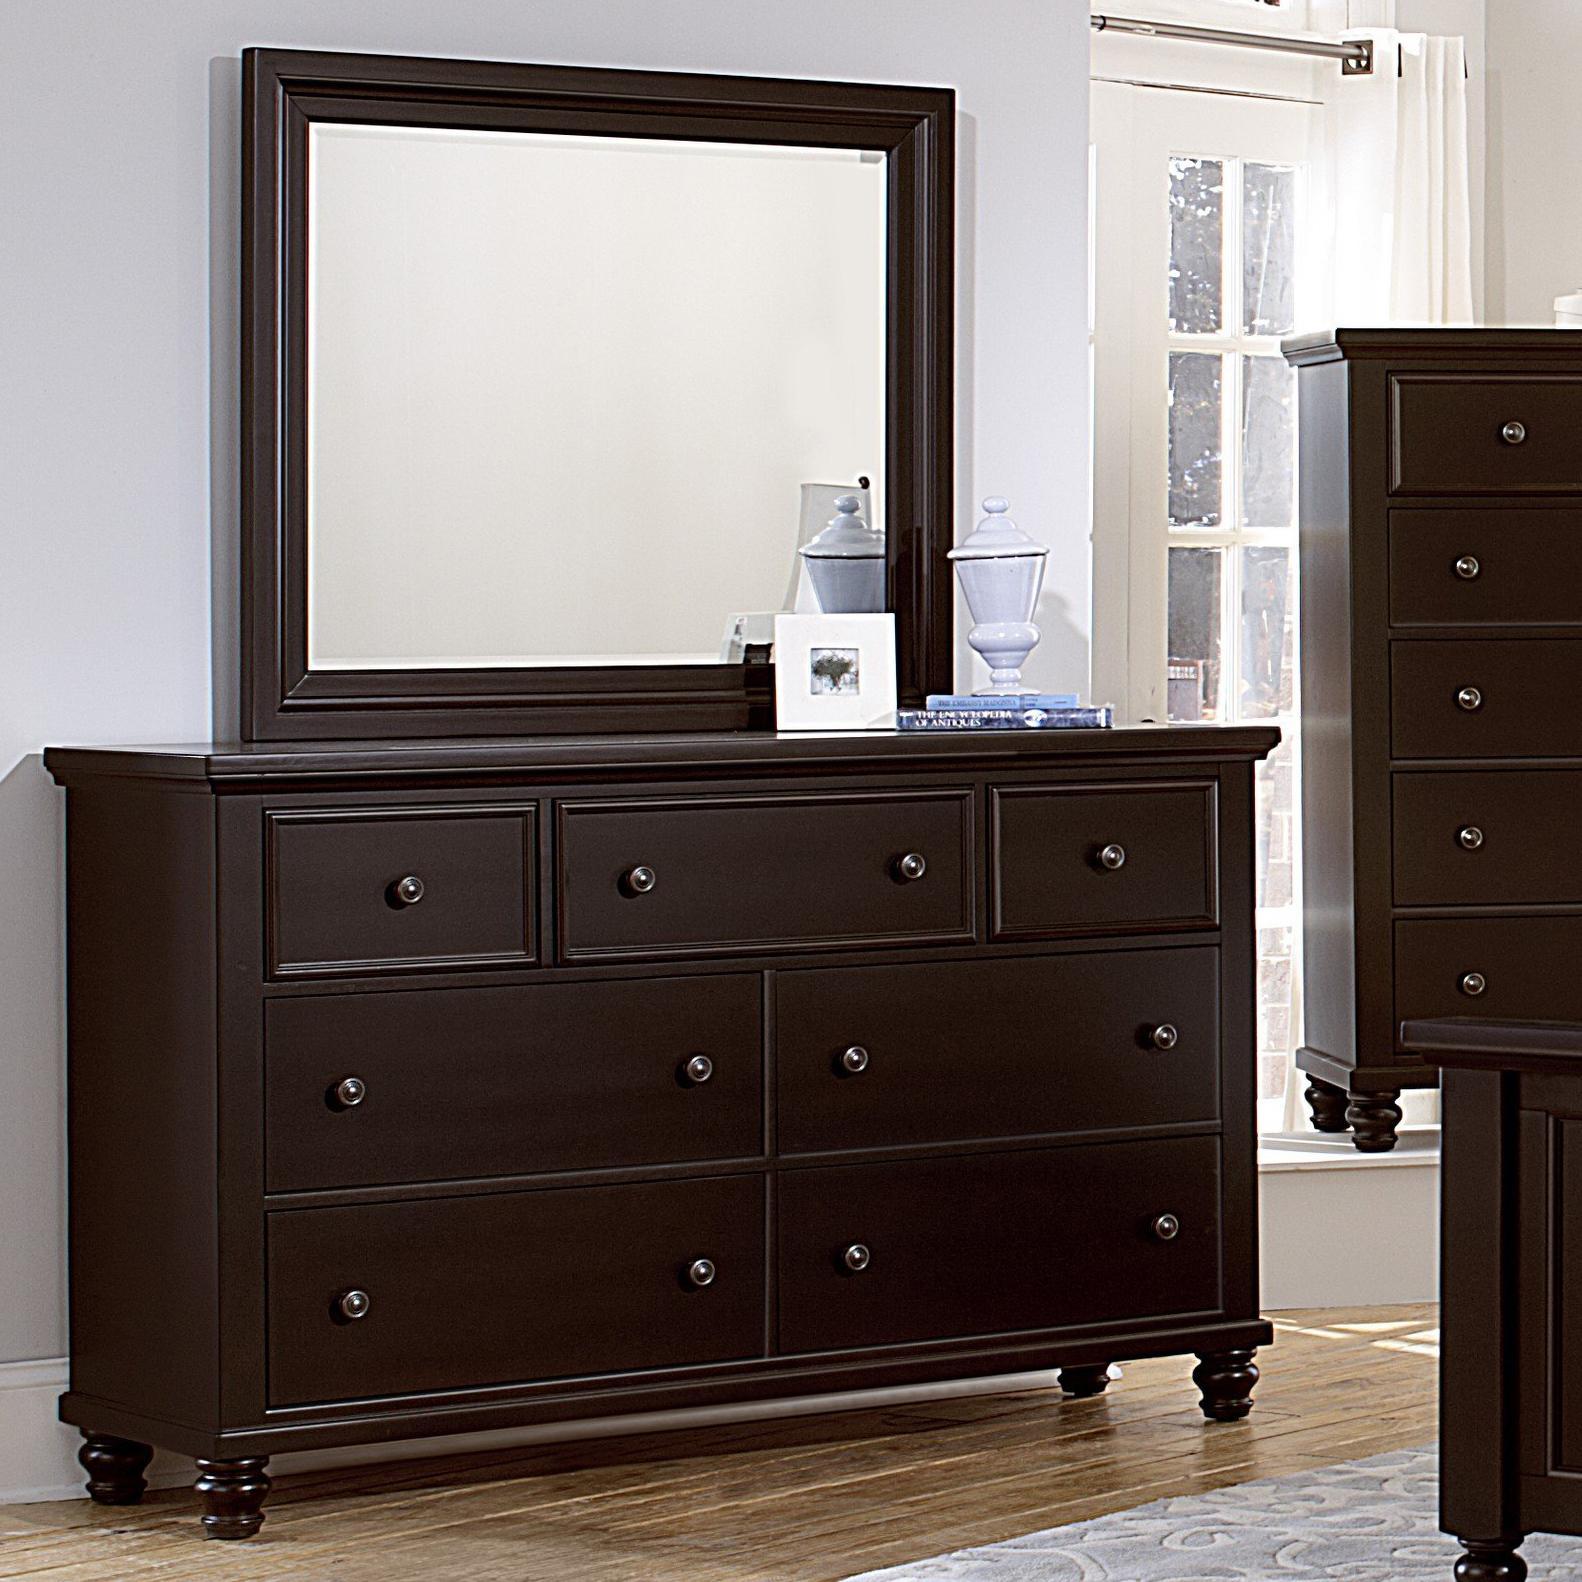 Vaughan Bassett Ellington Triple Dresser & Landscape Mirror - Item Number: 620-002+446